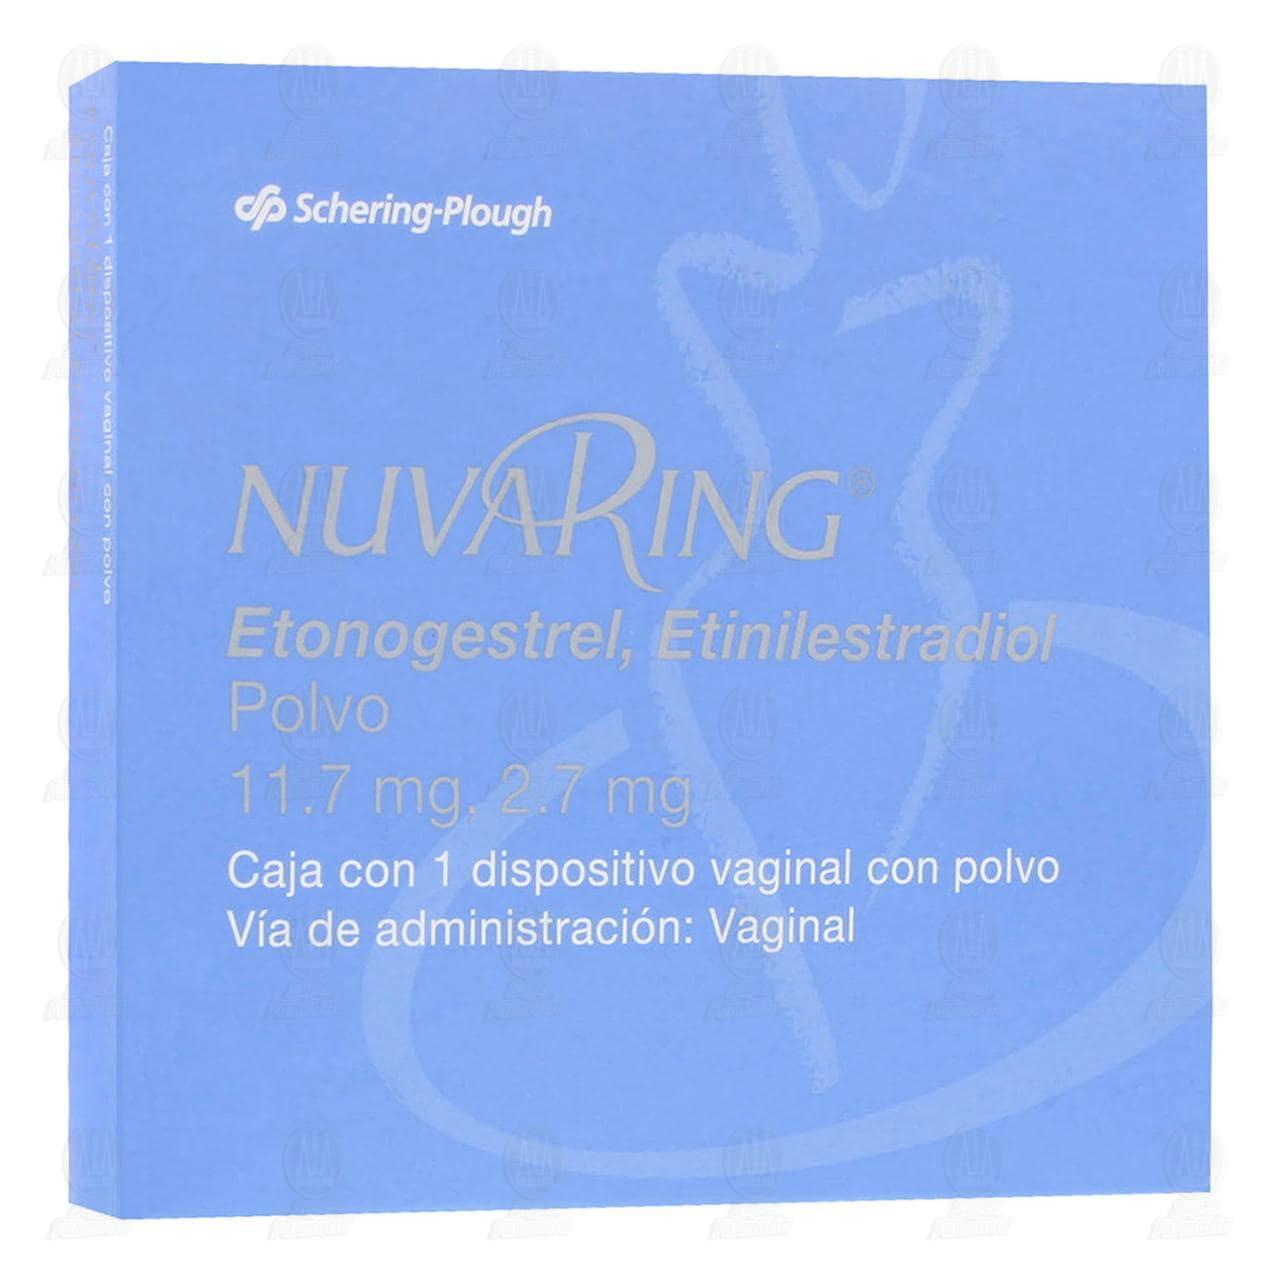 Nuvaring Dispositivo Vaginal con Polvo